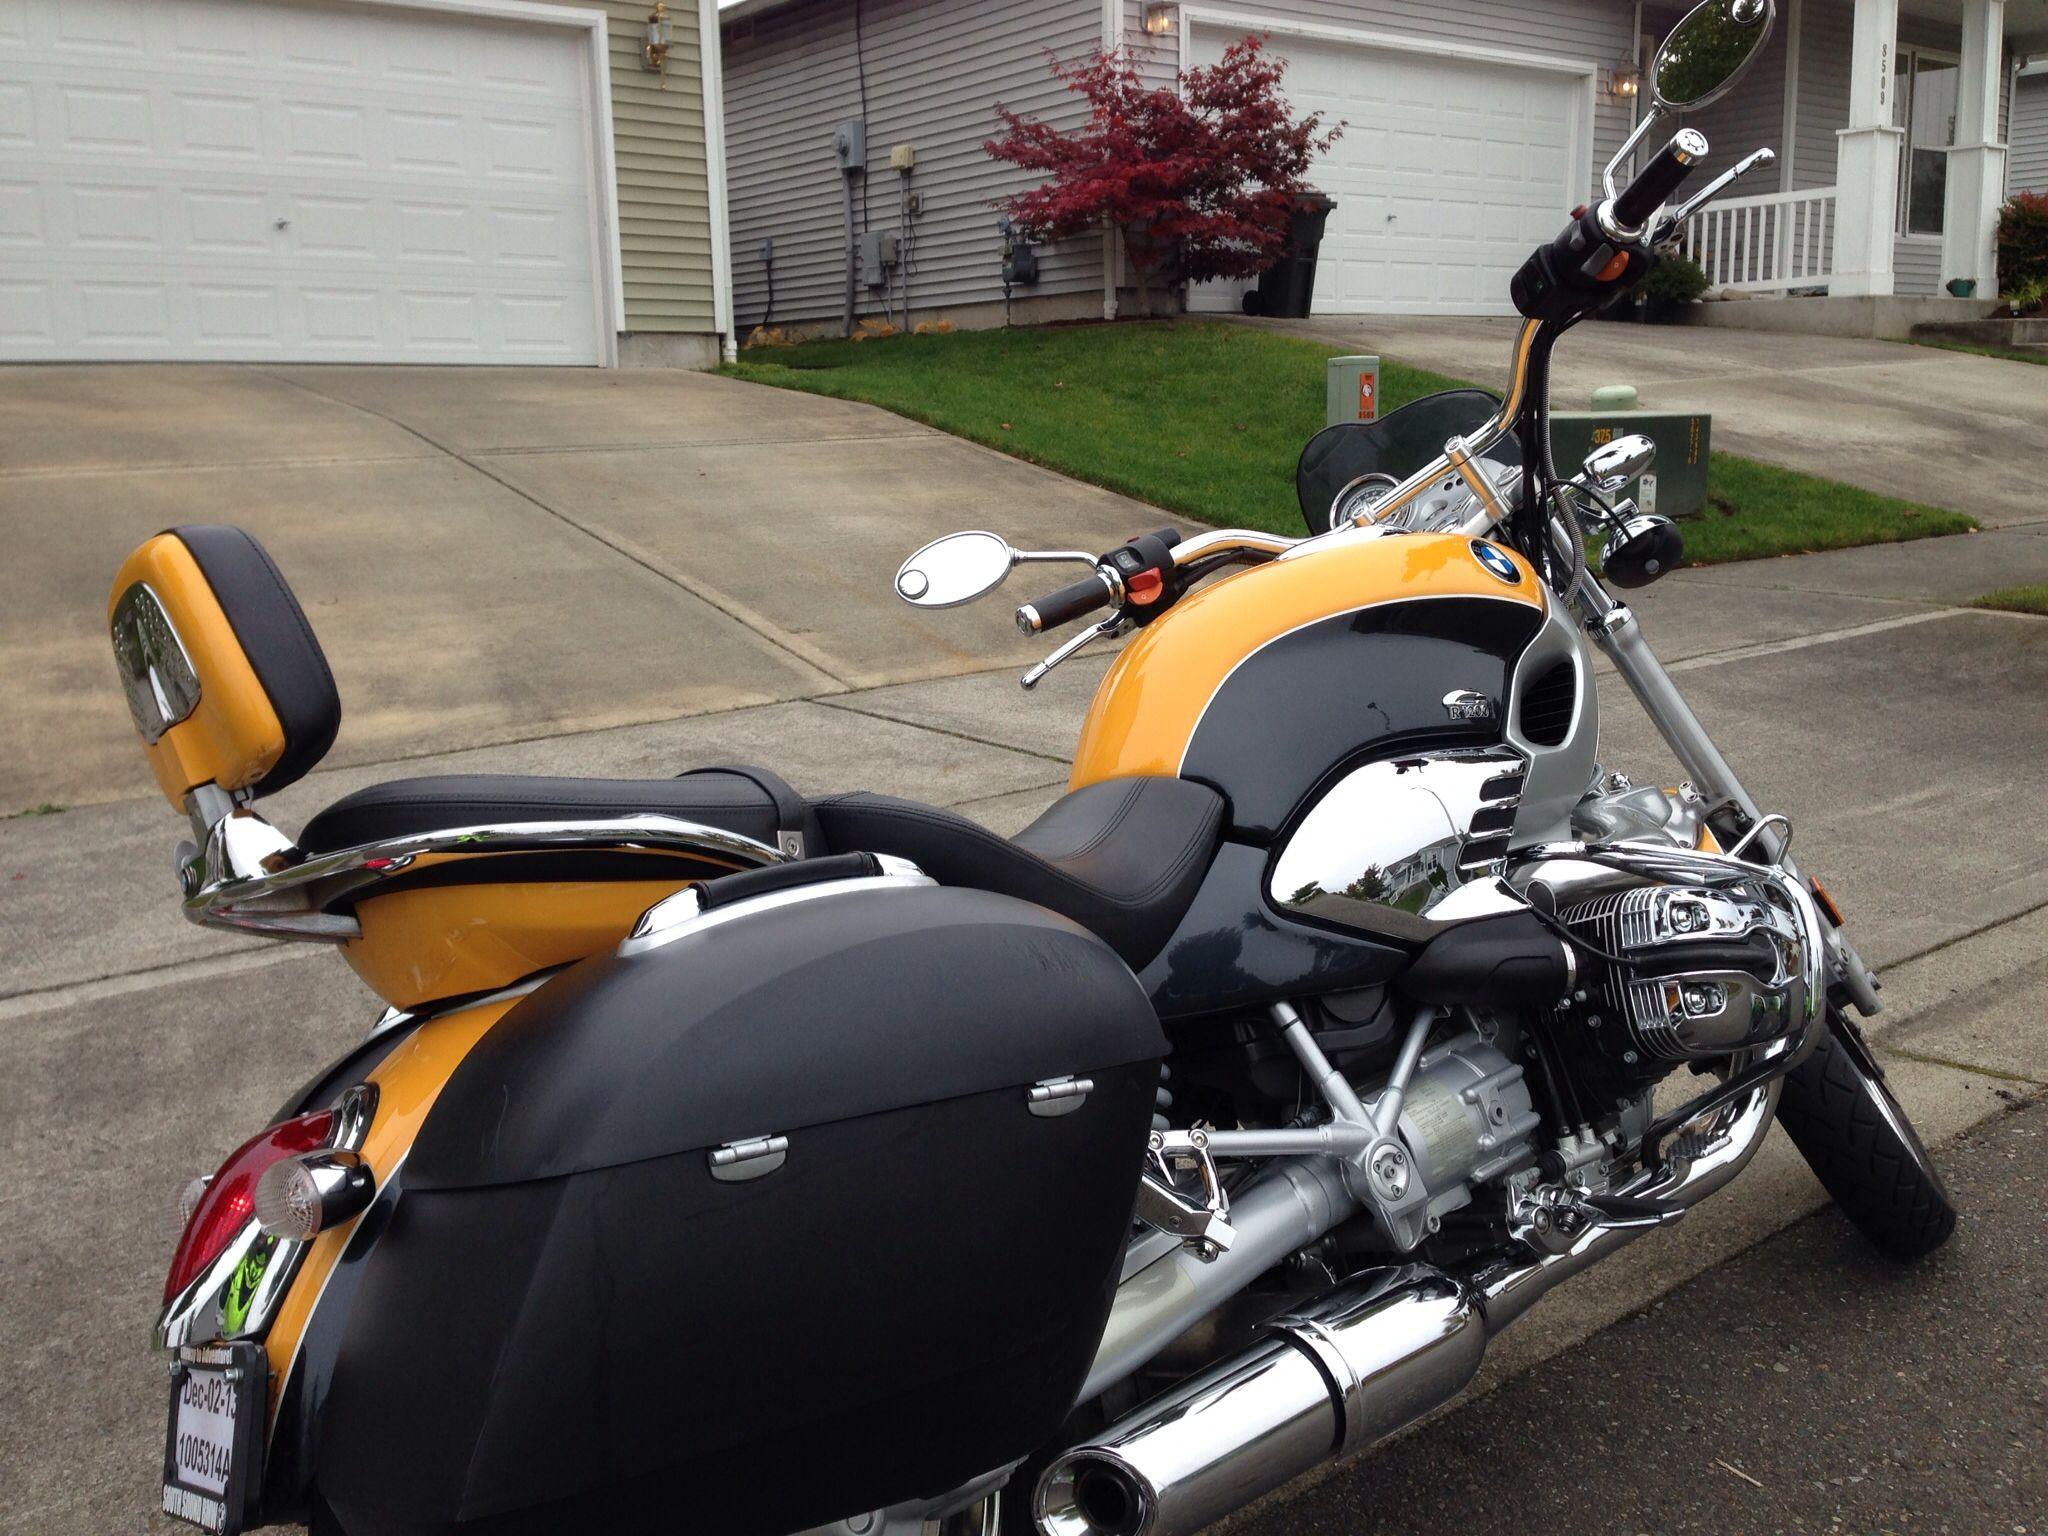 BMW R1200c Phoenix Motorbikes, Phoenix, Bmw, Motorcycles, Motorcycle,  Choppers